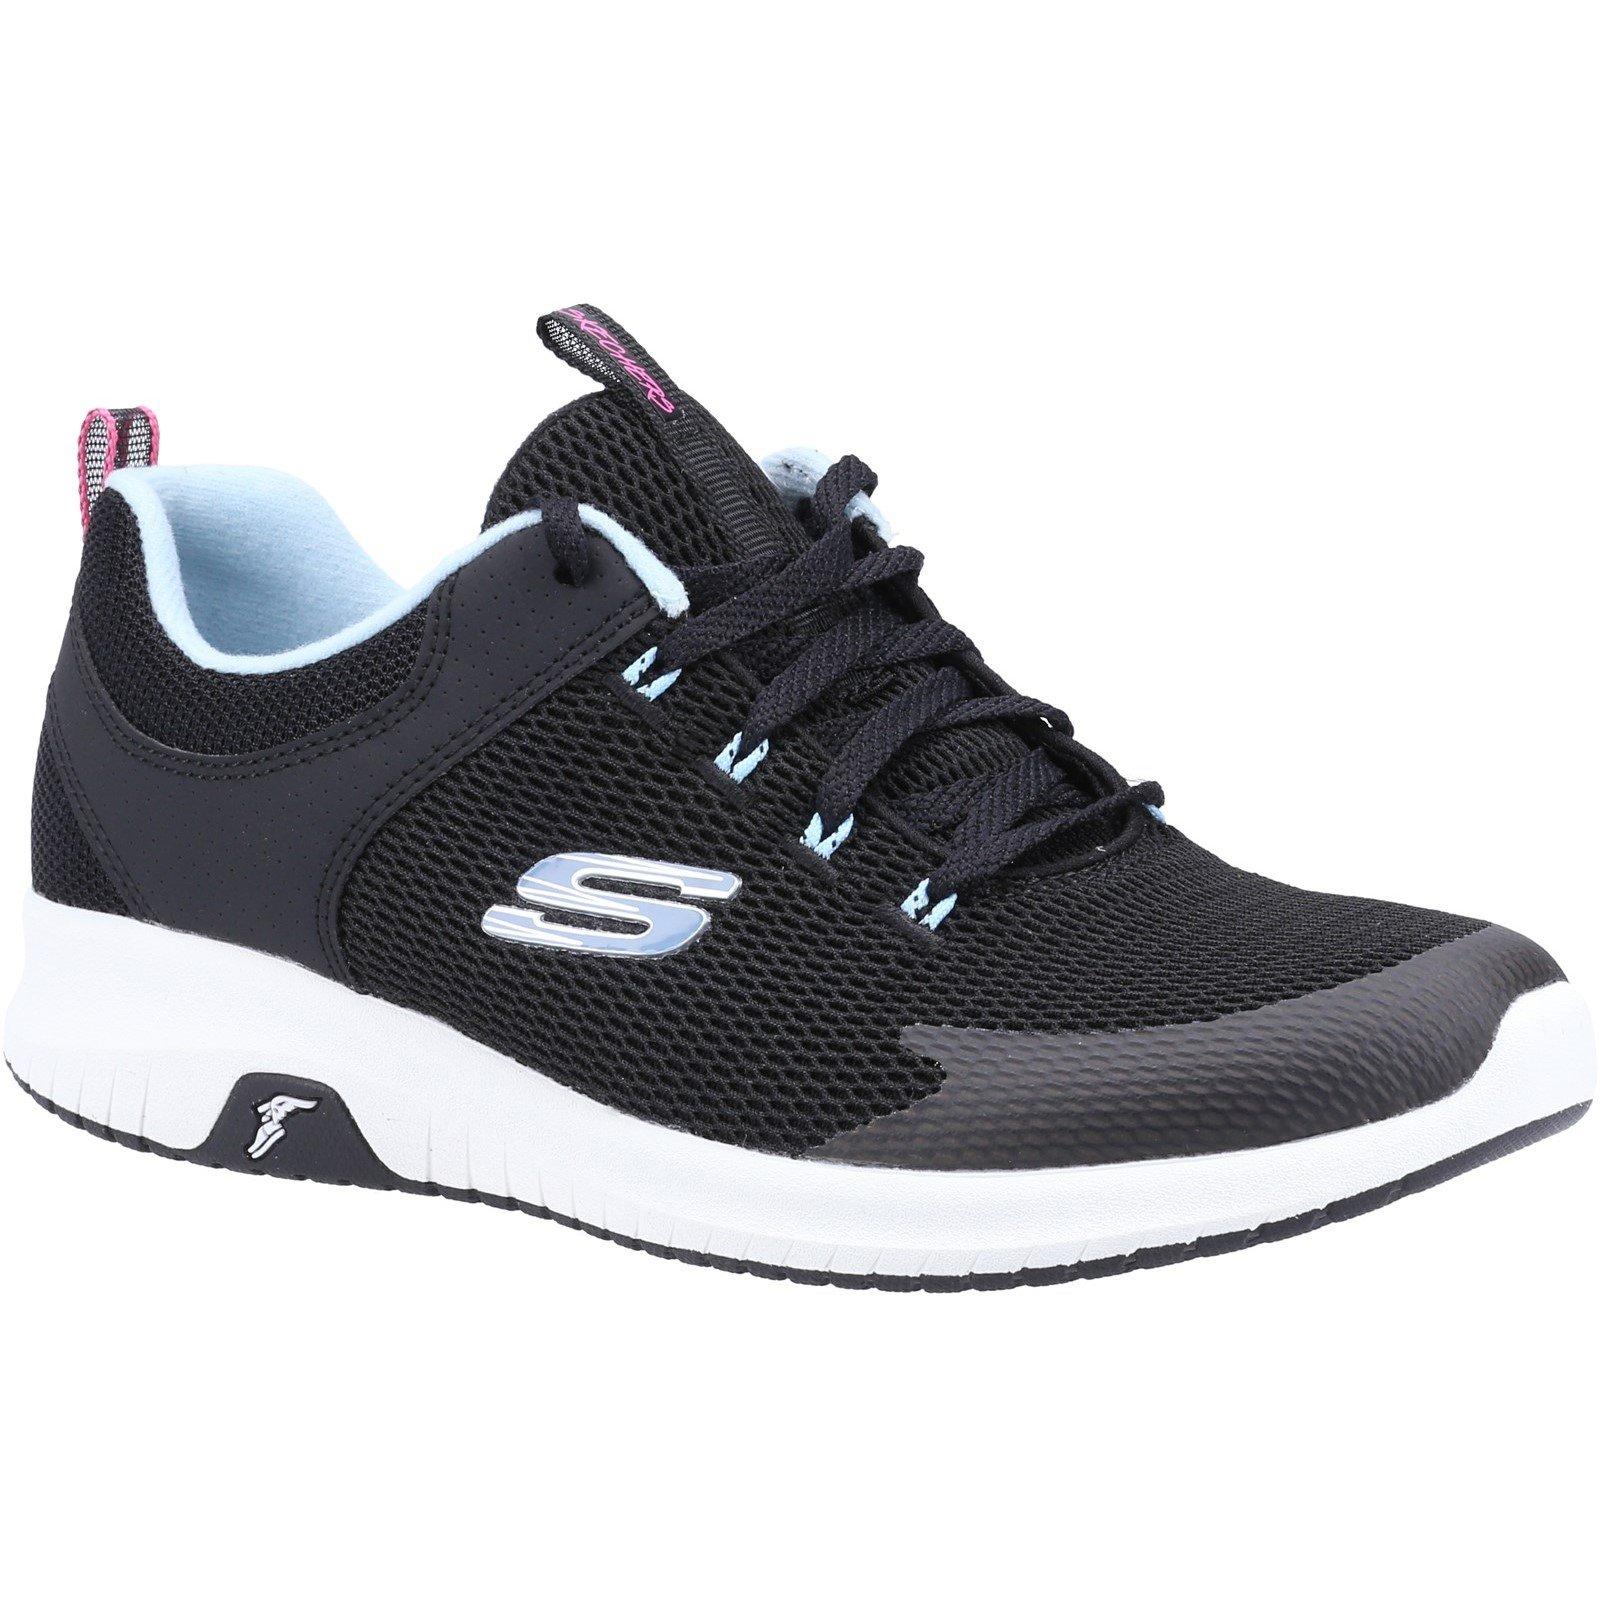 Skechers Women's Ultra Flex Prime Step Out Trainer Multicolor 32112 - Black/Light Blue 3